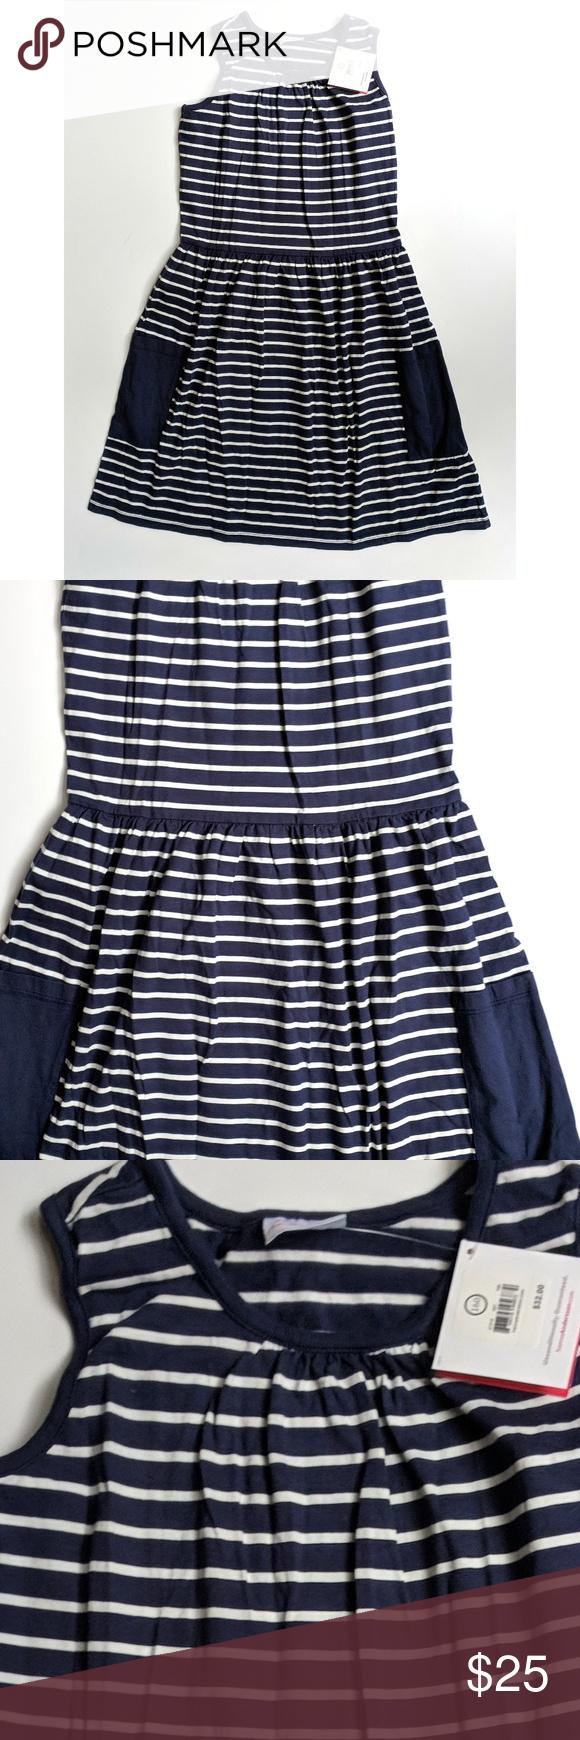 3f1cdf304c8 Hanna Andersson 160 So Breezy Sundress Dress Navy Hanna Andersson Girls So  Breezy Sundress Dress Navy